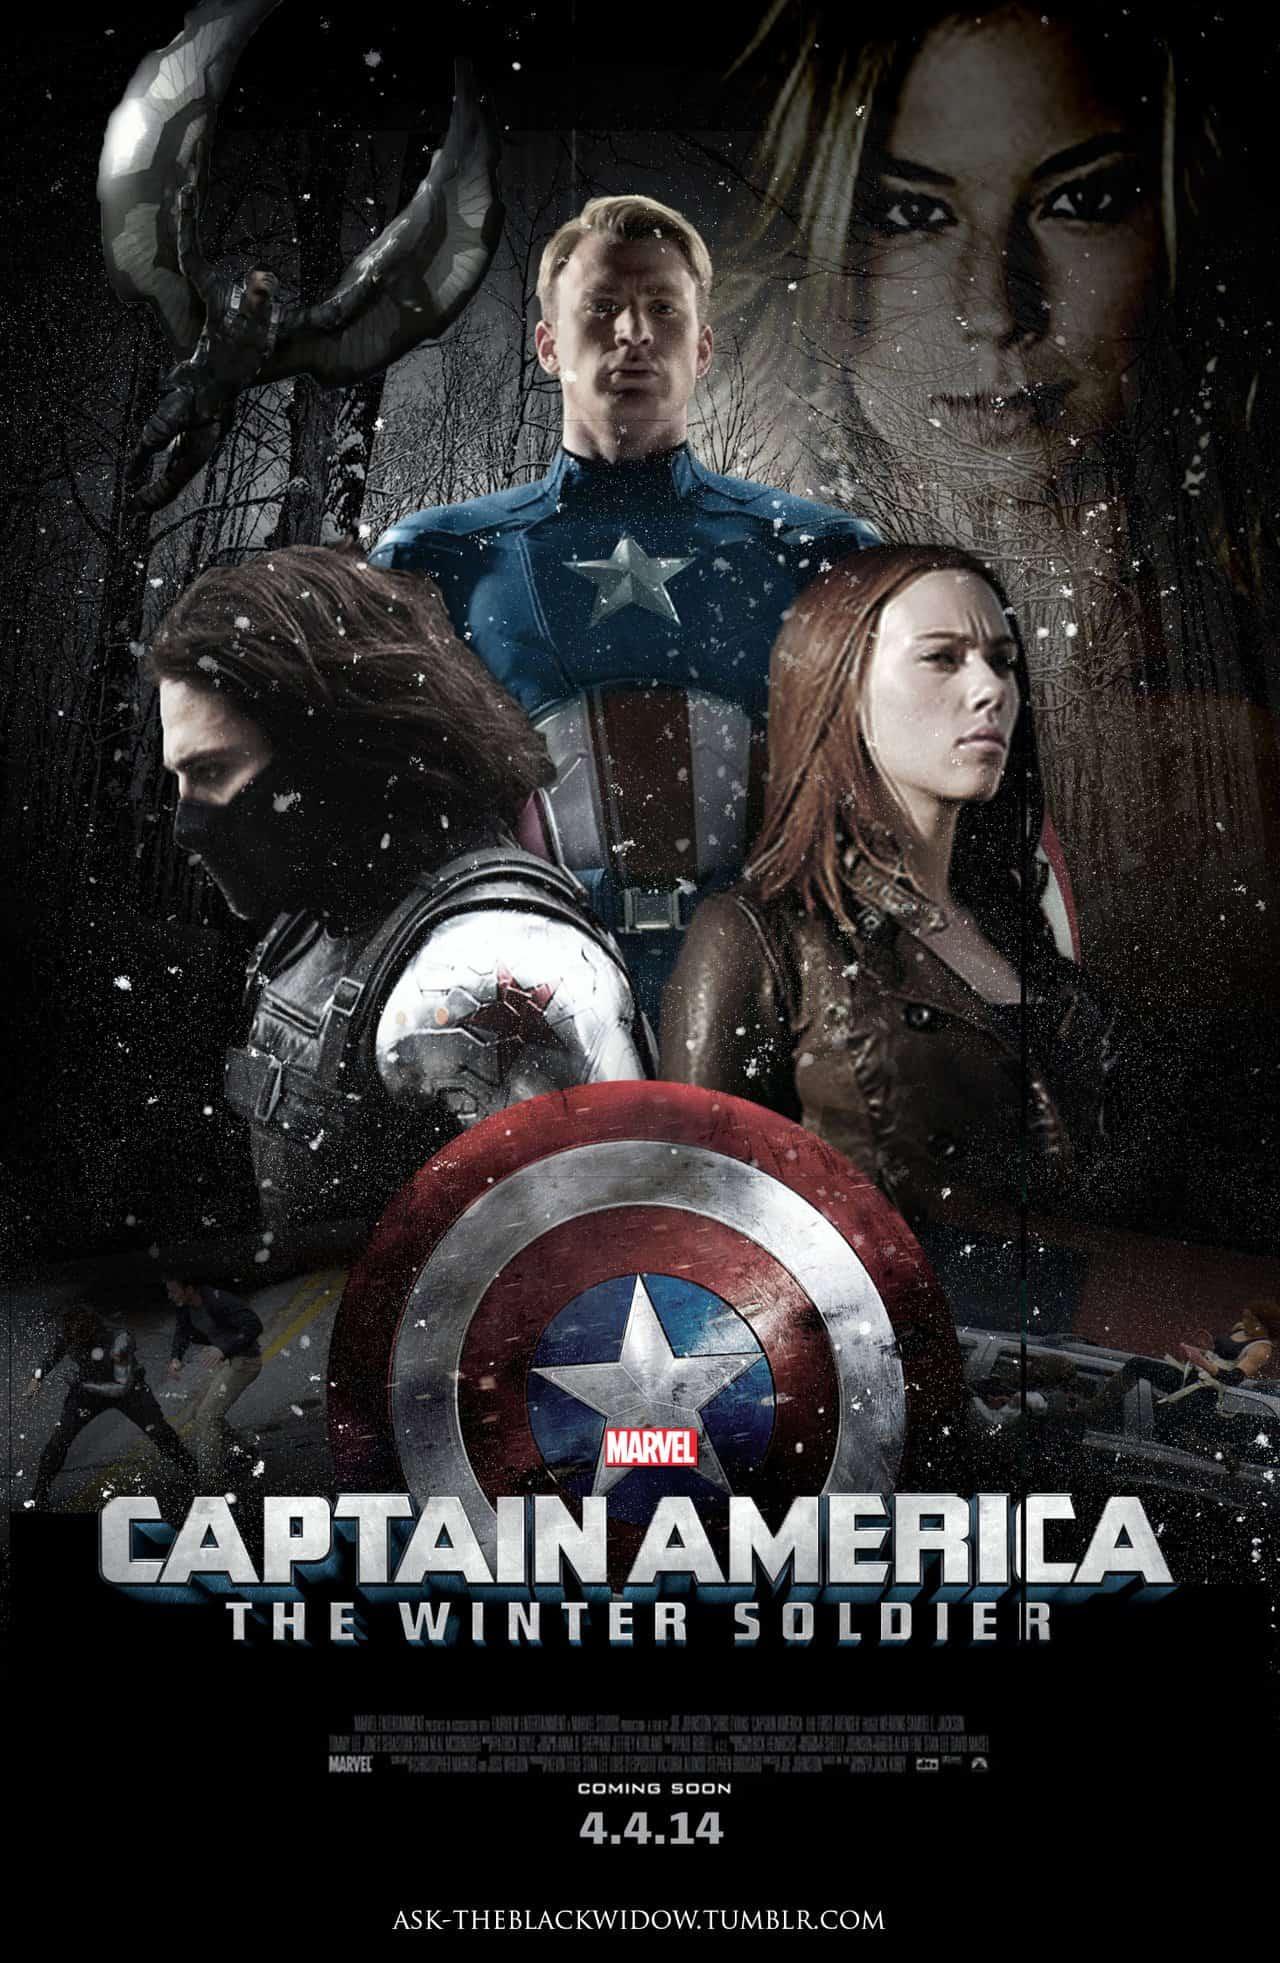 captain_america_2__the_winter_soldier_poster_by_littlemissromanoff-d6dgl3m